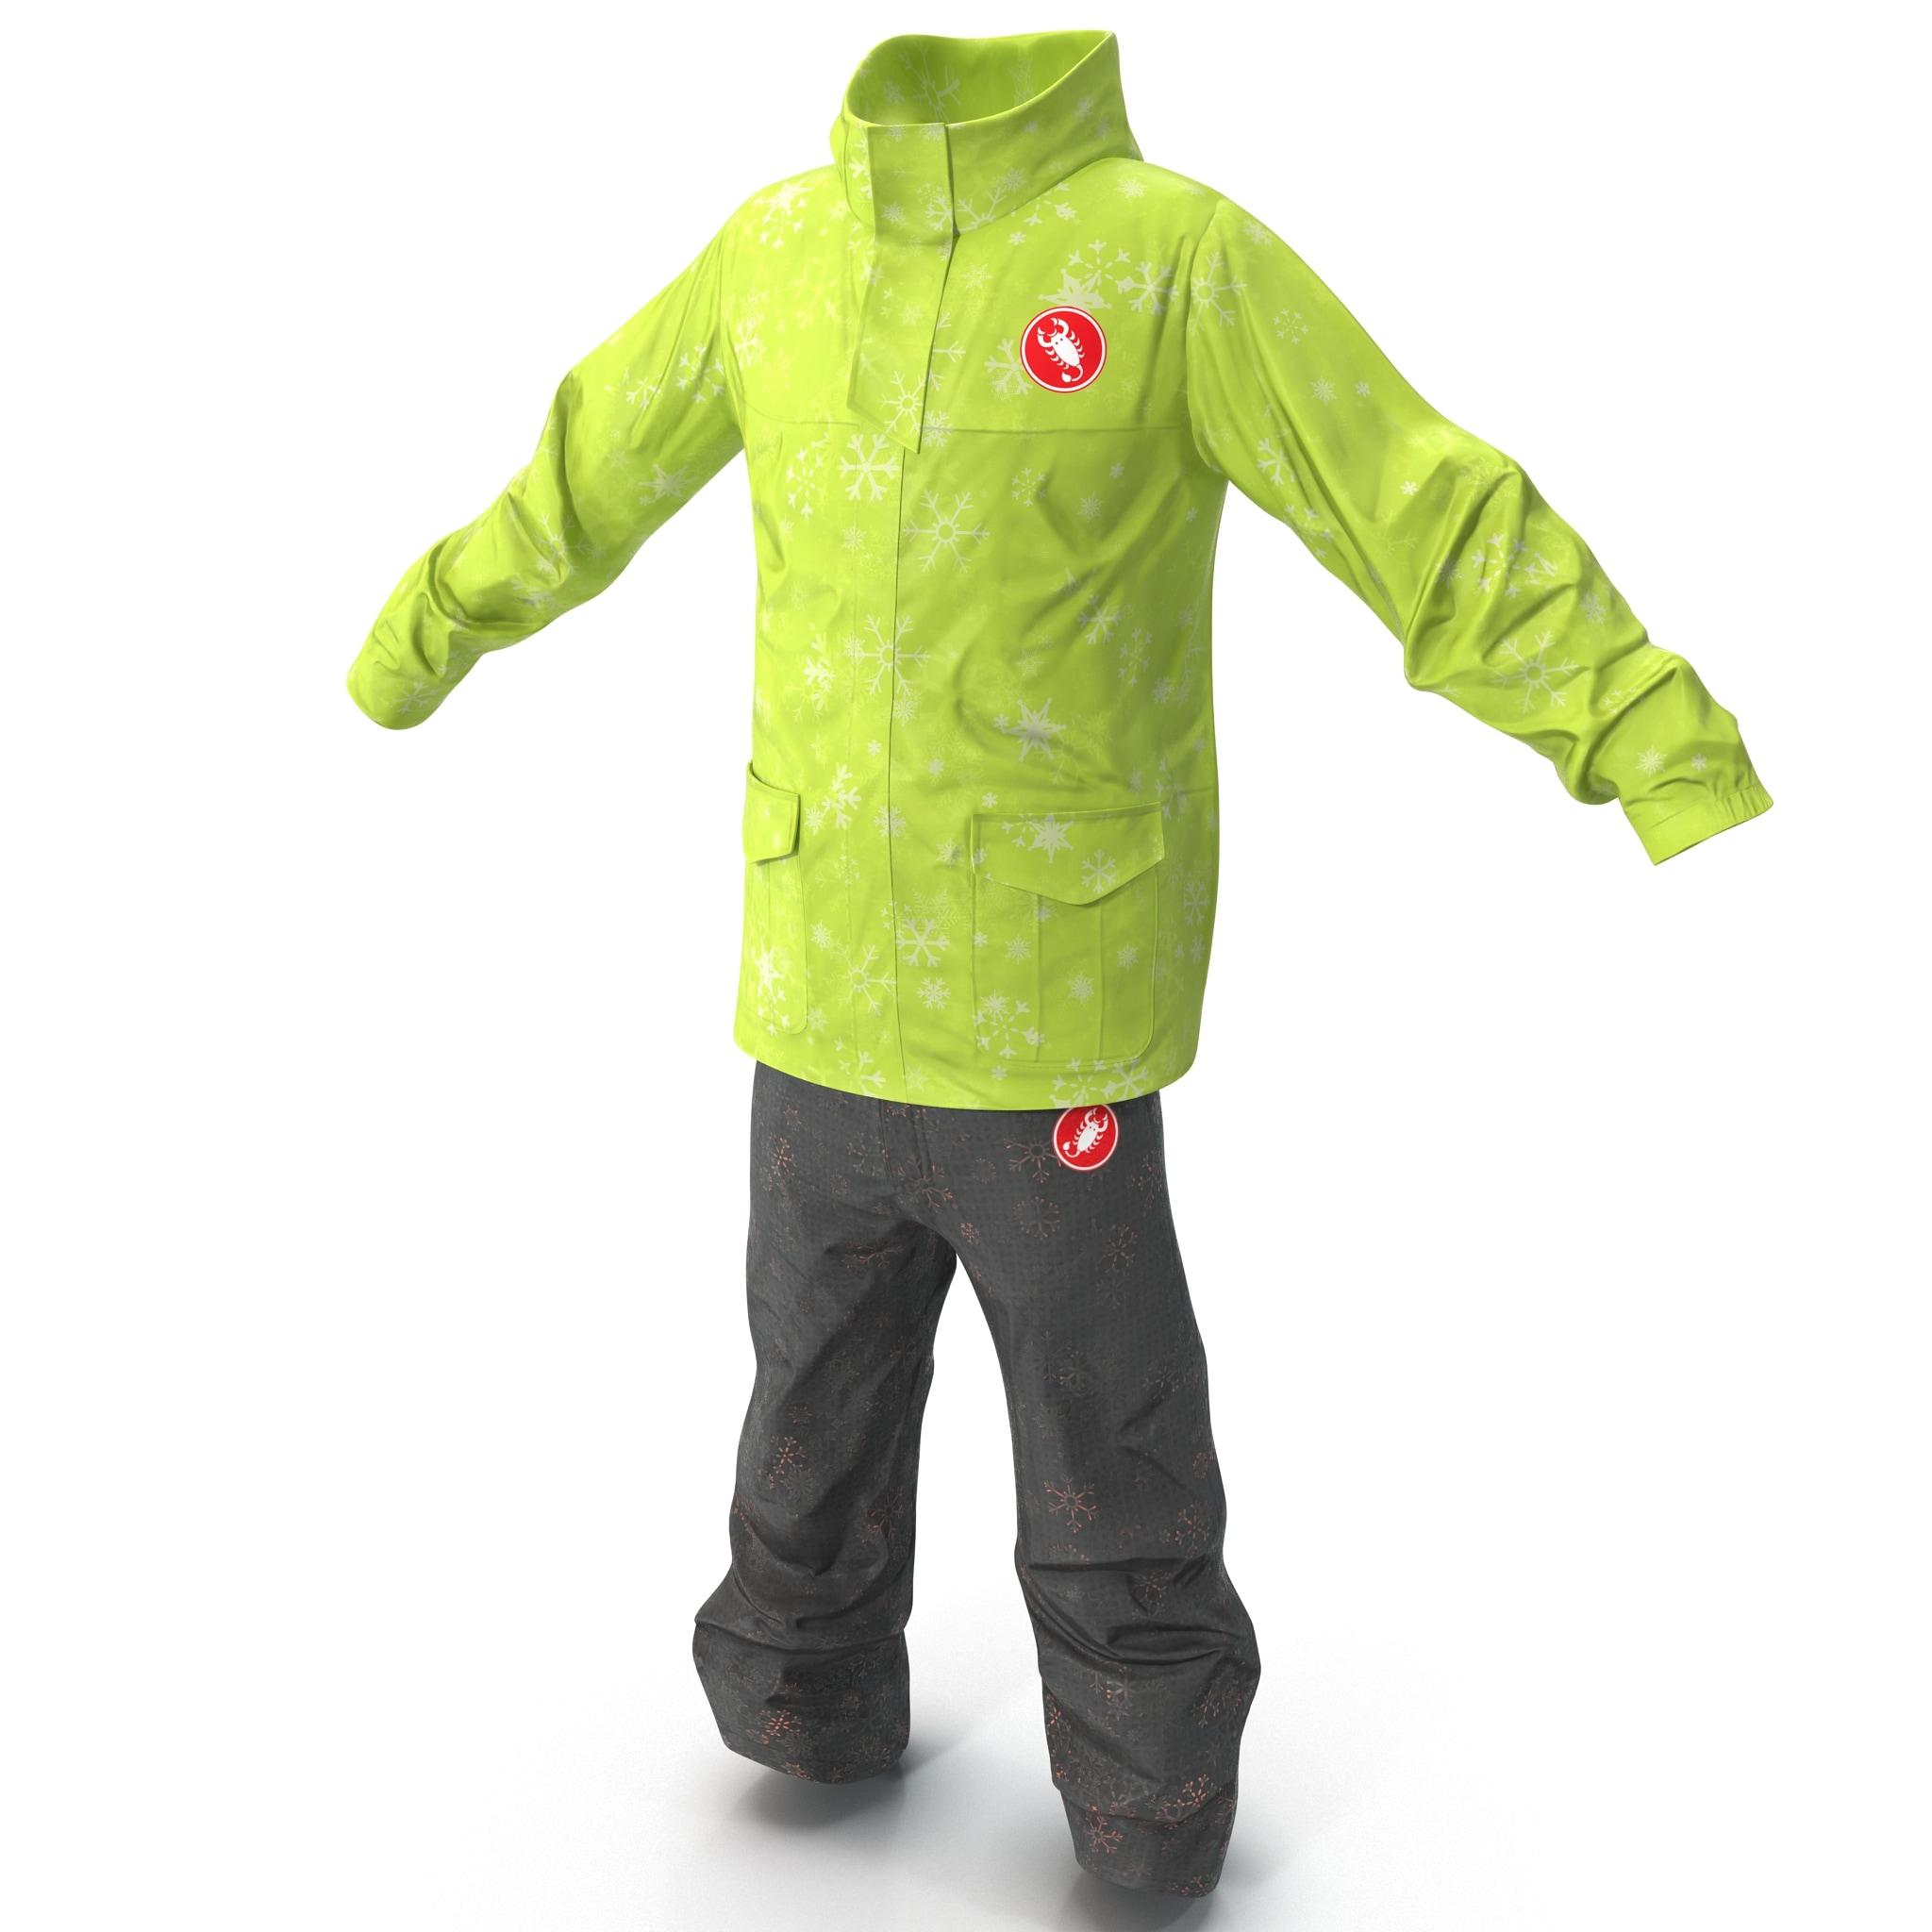 Snowboard Clothes 3_2.jpg